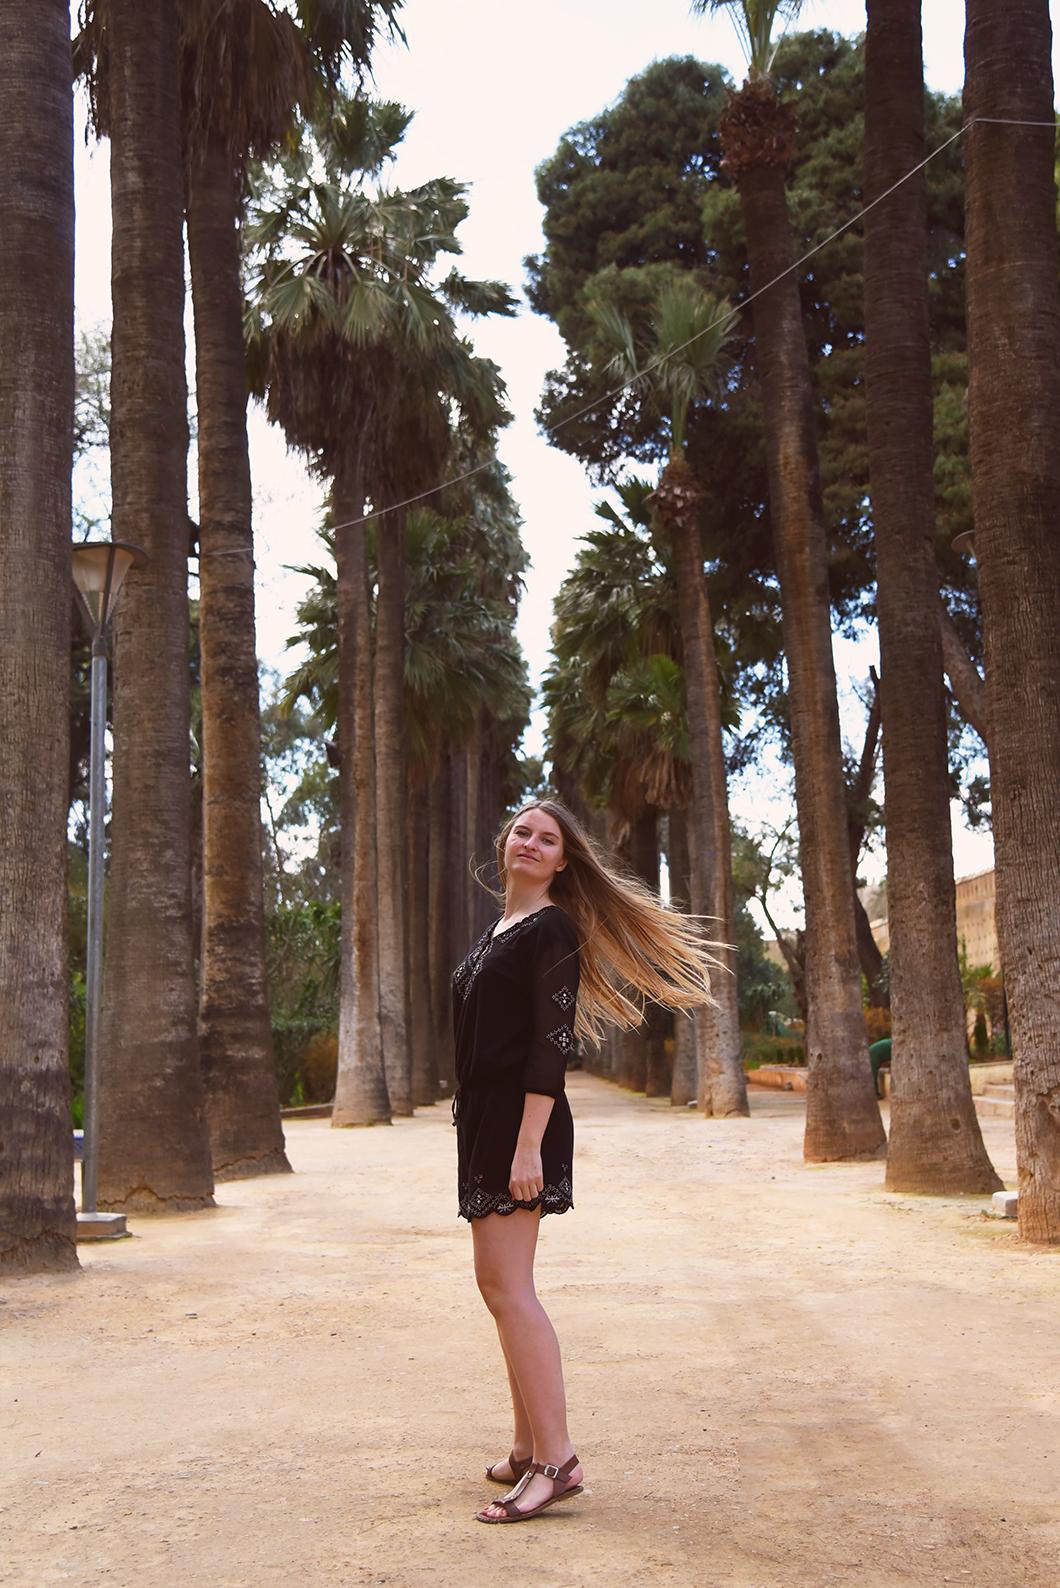 Jardin Jnan Sbil - visites incontournables à Fès